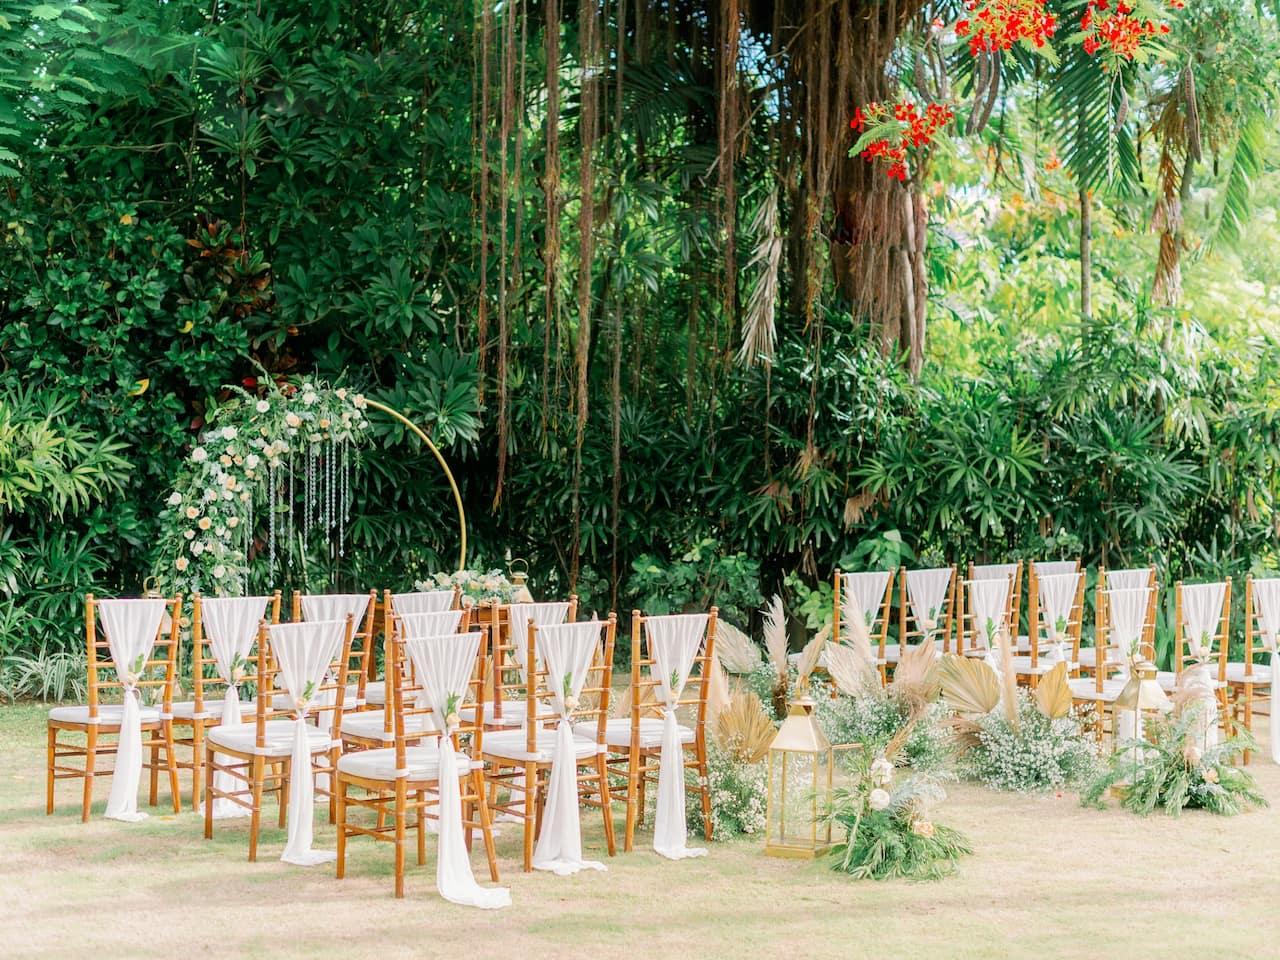 The Hyatt Regency, Wantilan Ballroom Banquet Setup for Weddings in Sanur Bali